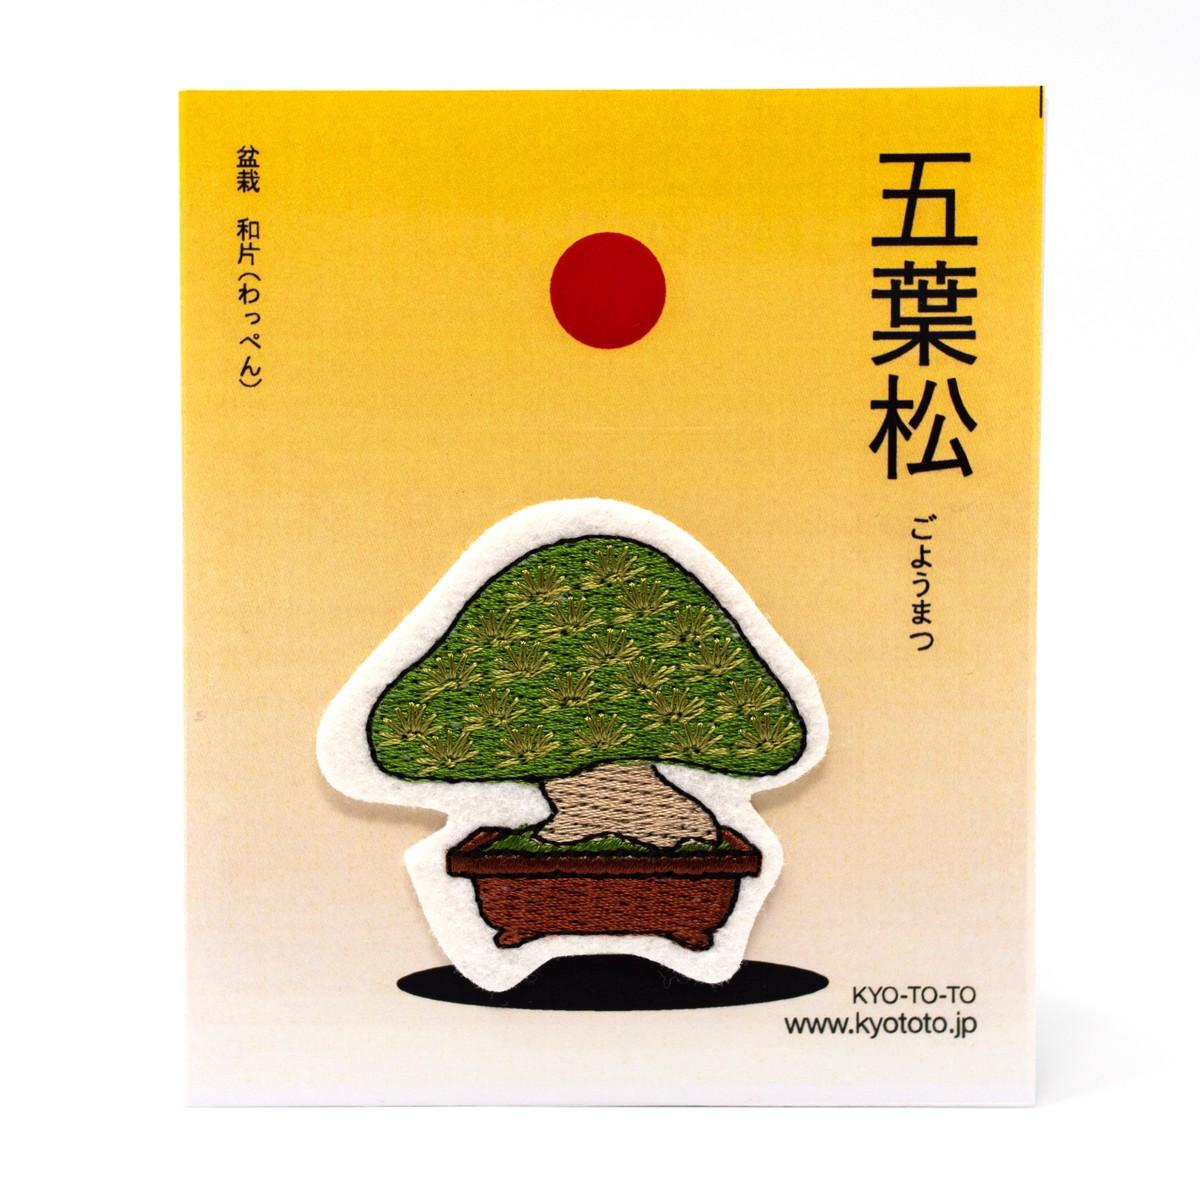 Photo of Himekomatsu Embroidered Patch